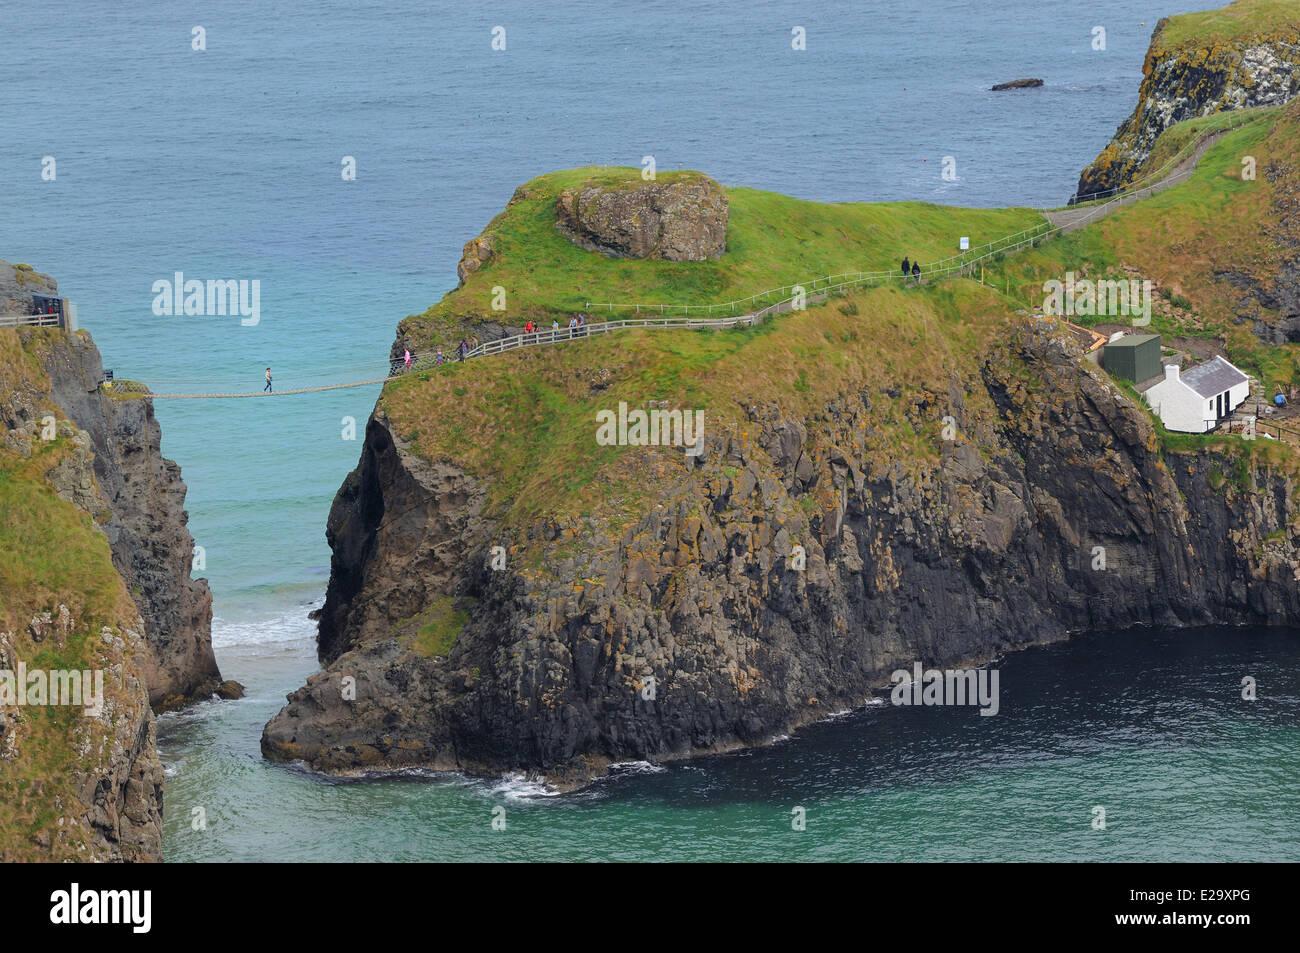 United Kingdom, Northern Ireland, County Antrim, Antrim coast, Carrick-a-rede rope bridge - Stock Image